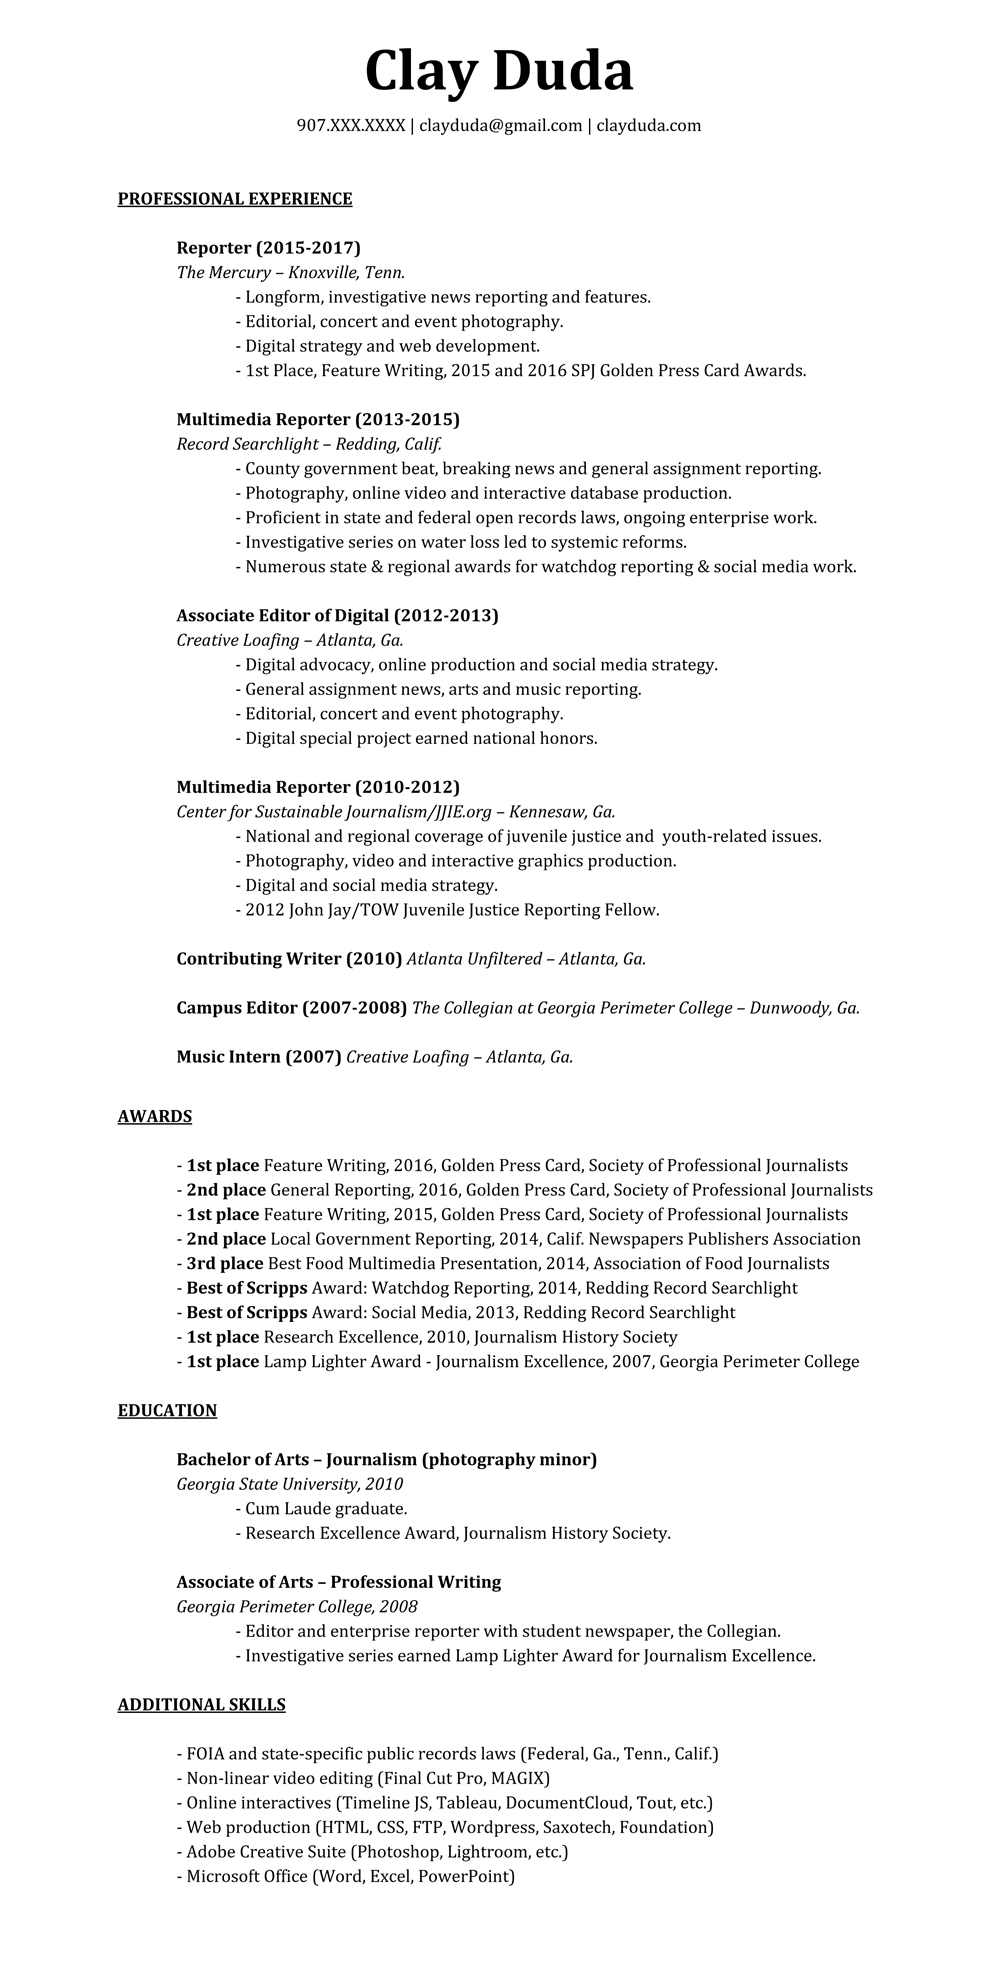 View A Resume | Resume Awards Clay Duda